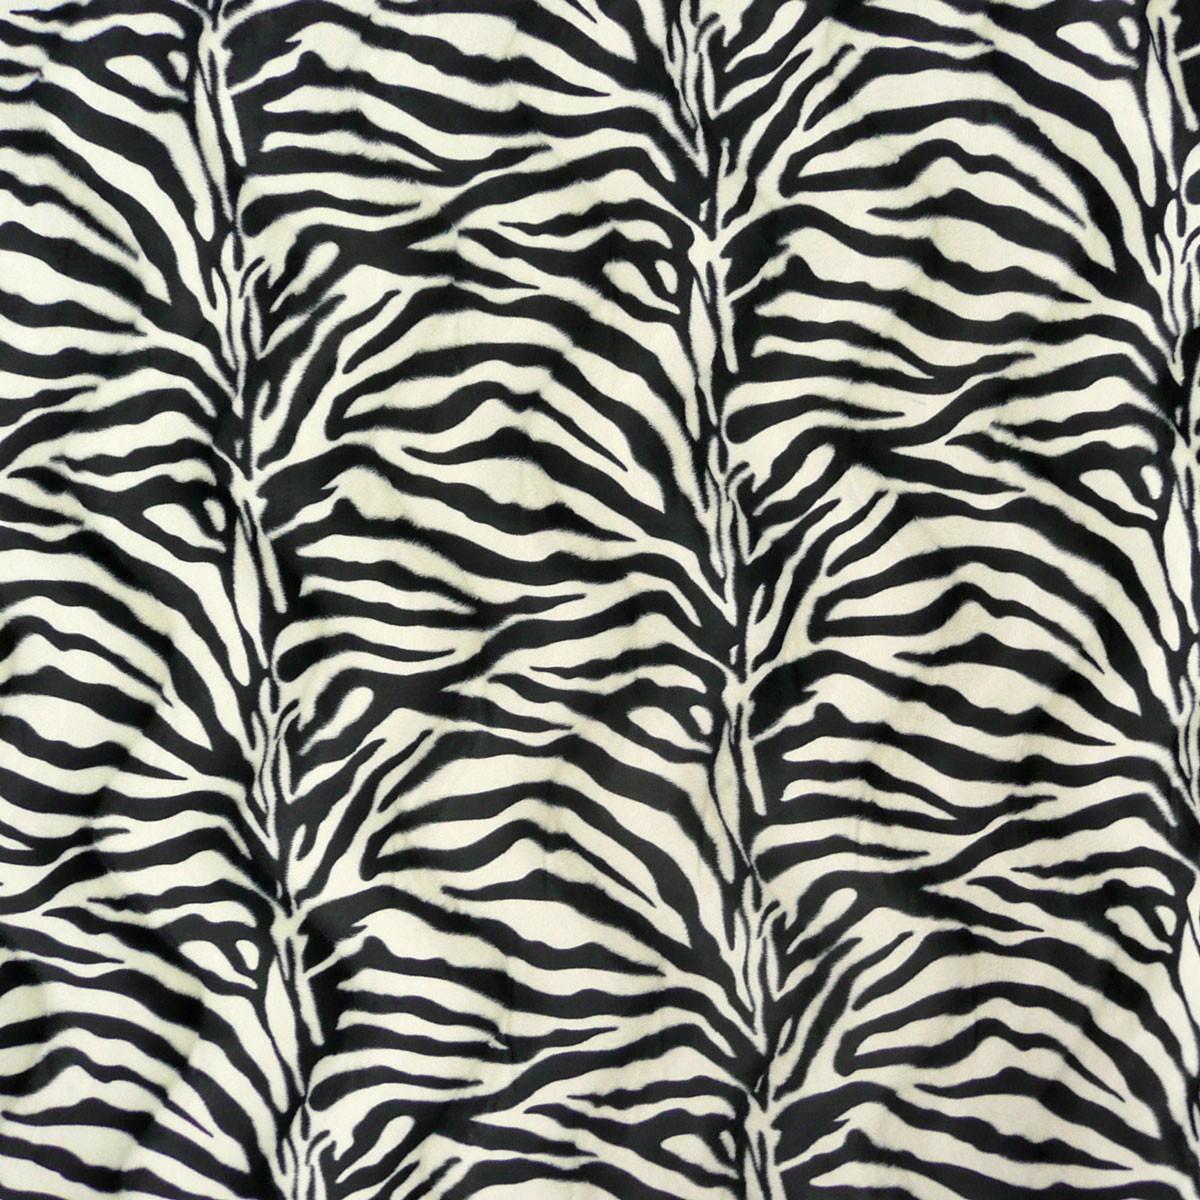 pl sch velour fellstoff fellimitat kunstfell stoff zebra. Black Bedroom Furniture Sets. Home Design Ideas